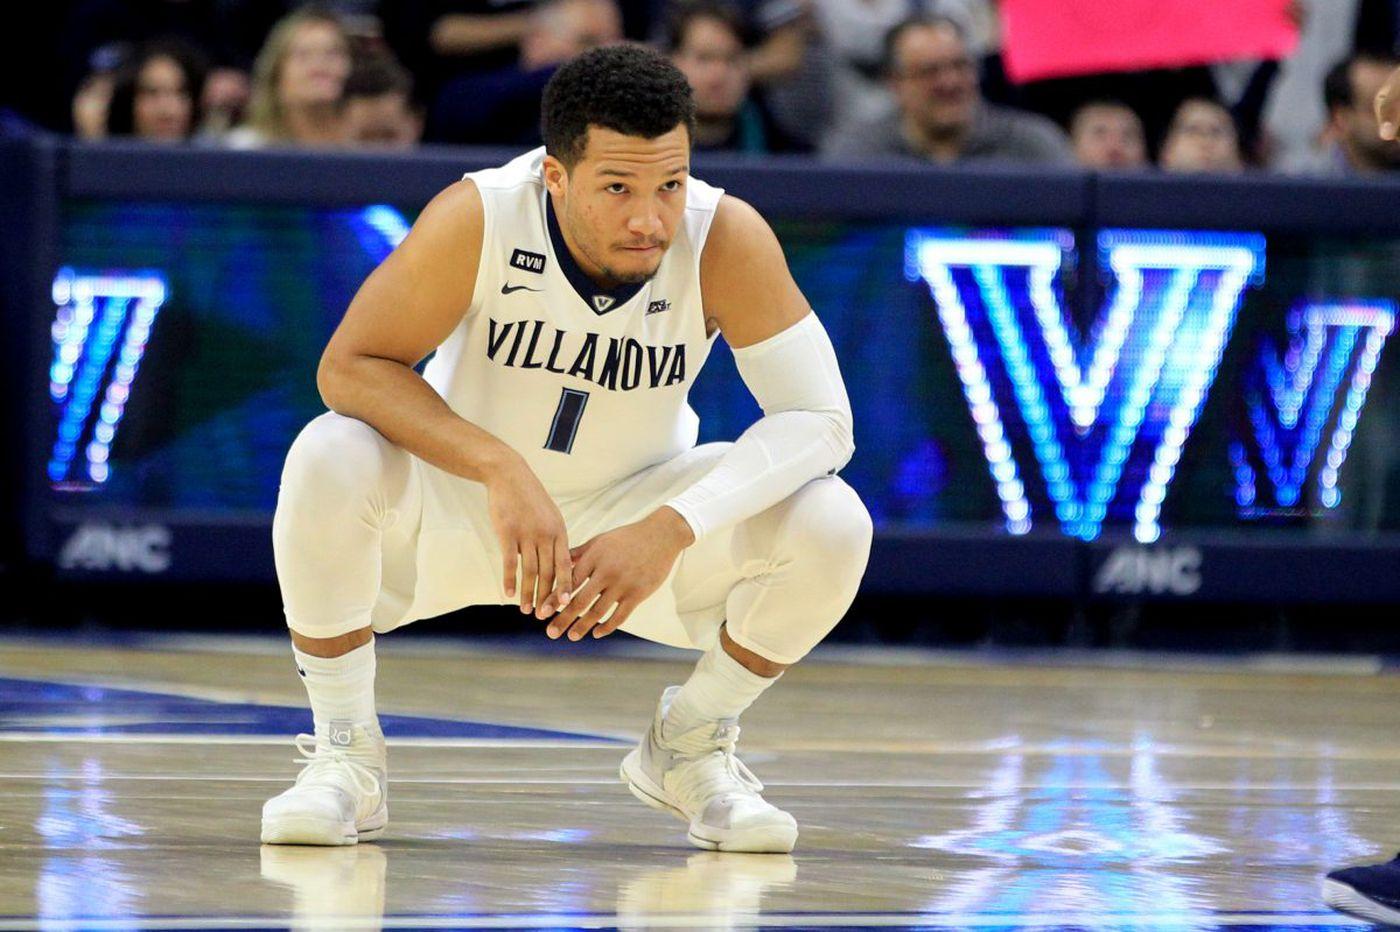 Villanova's Jalen Brunson entering the NBA draft